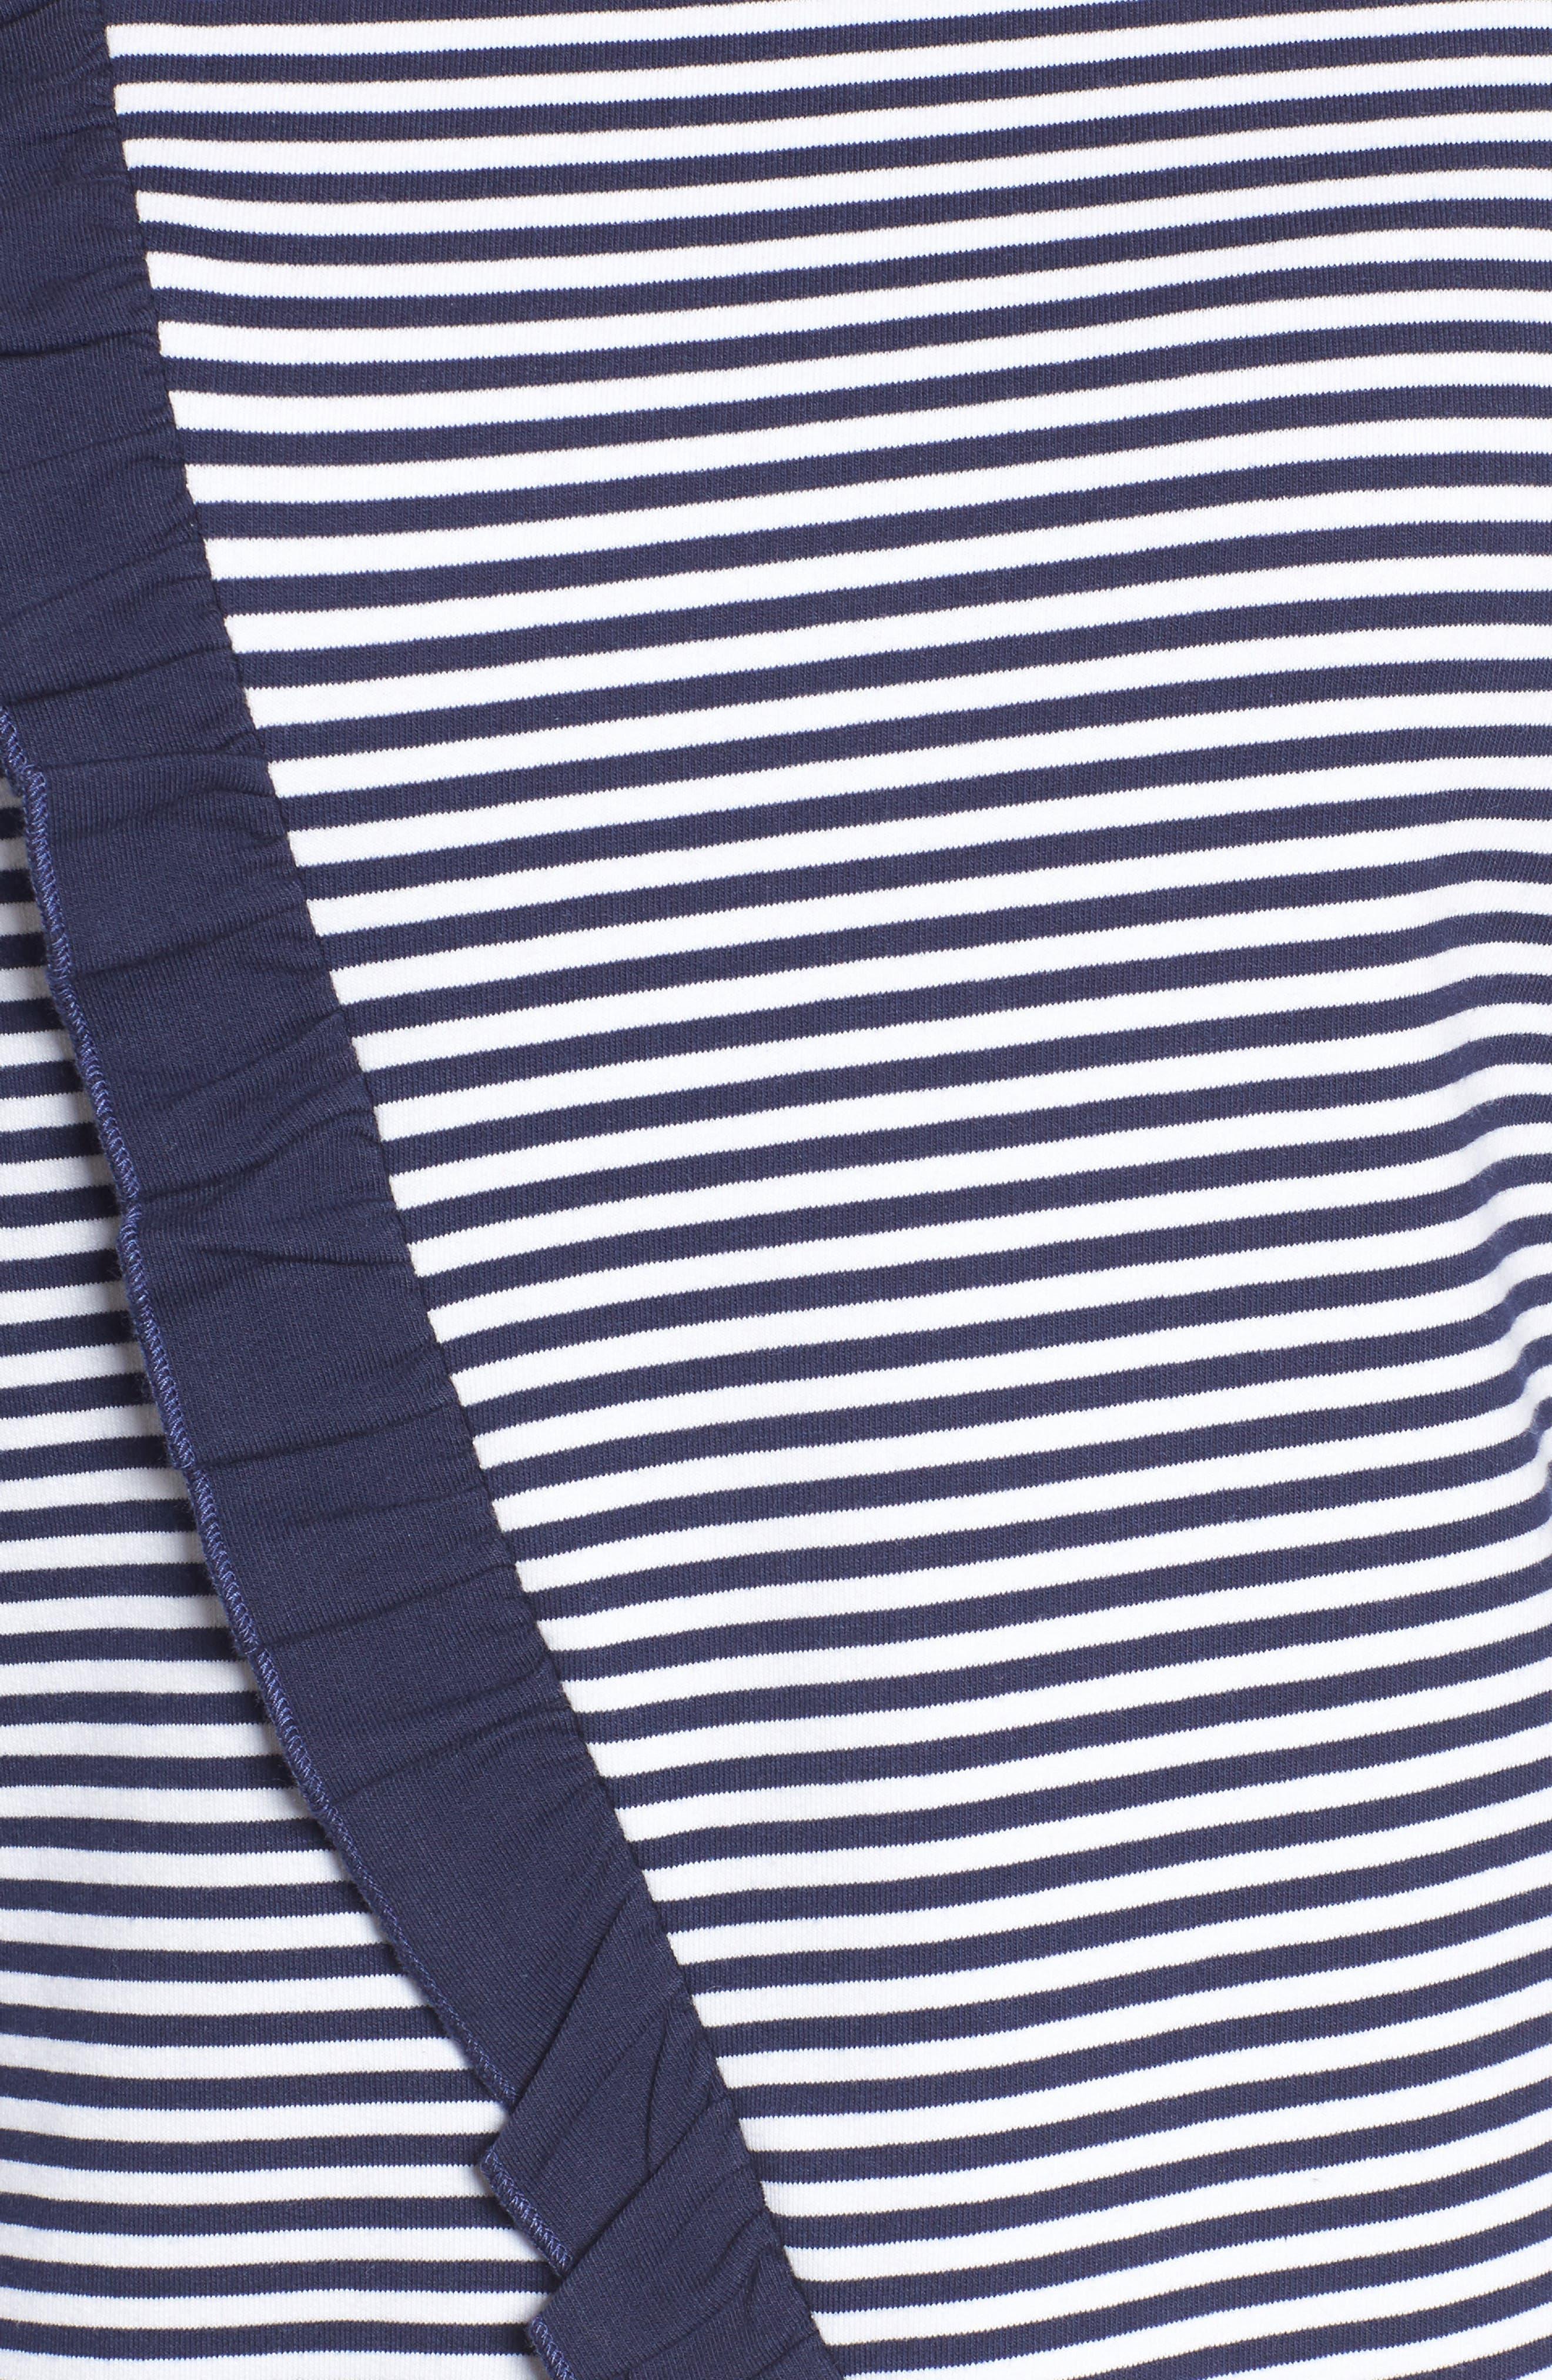 Ruffle Wrap Top,                             Alternate thumbnail 5, color,                             Navy- White Stripe